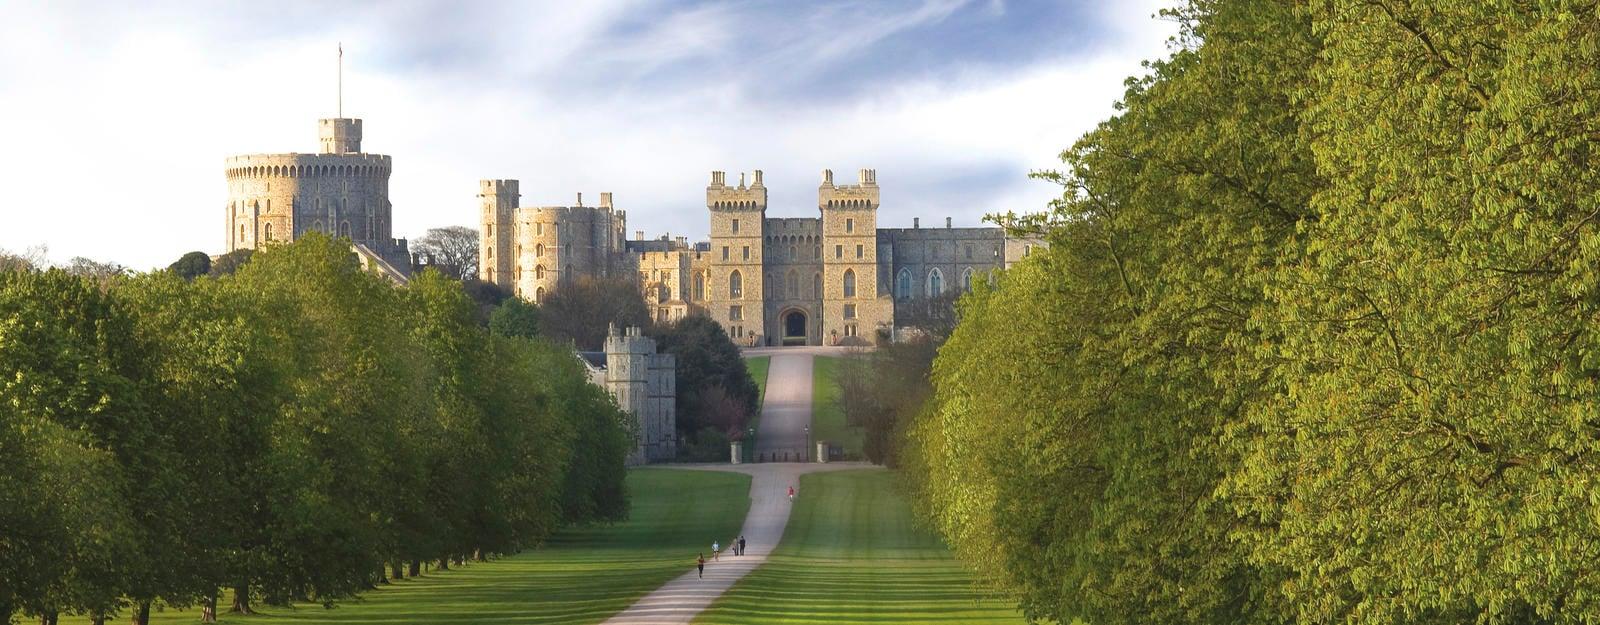 The long walk to Windsor Castle